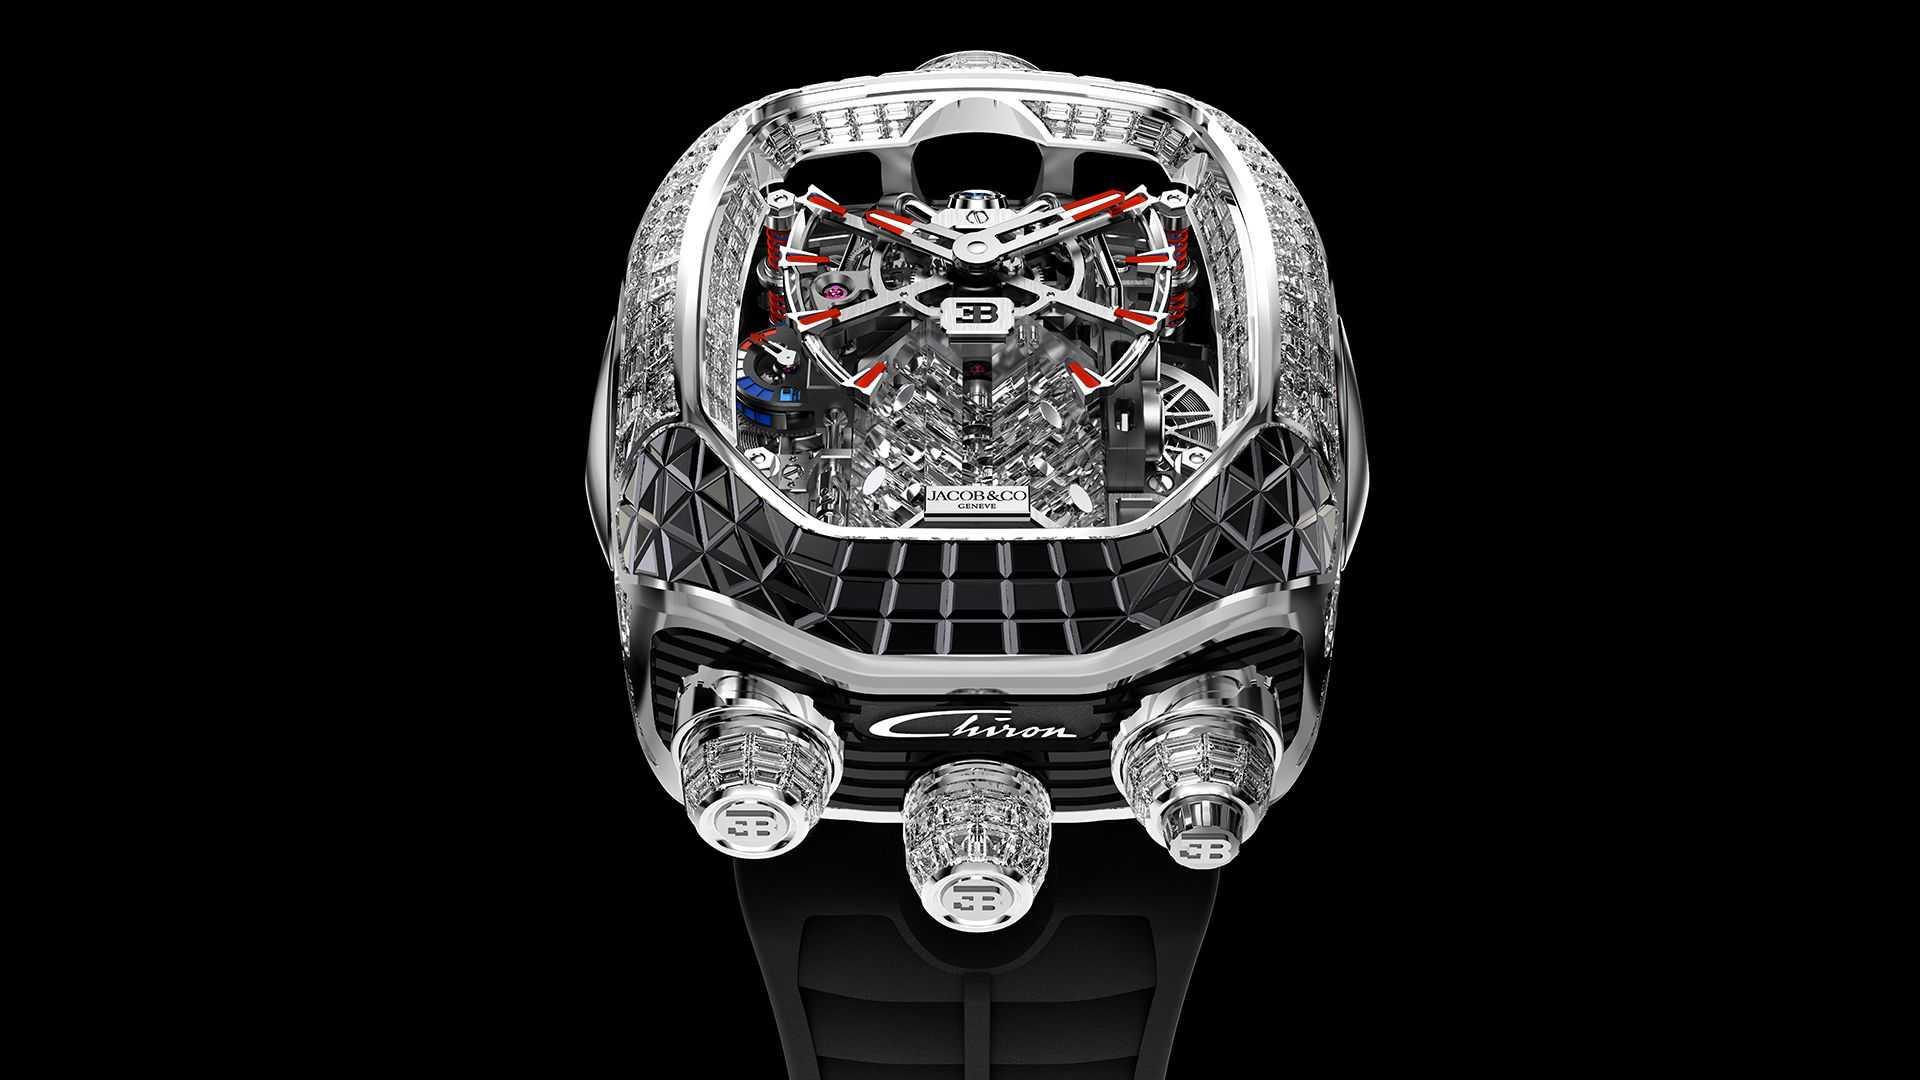 Jacob-Co-Bugatti-Chiron-Tourbillon-Watch-3